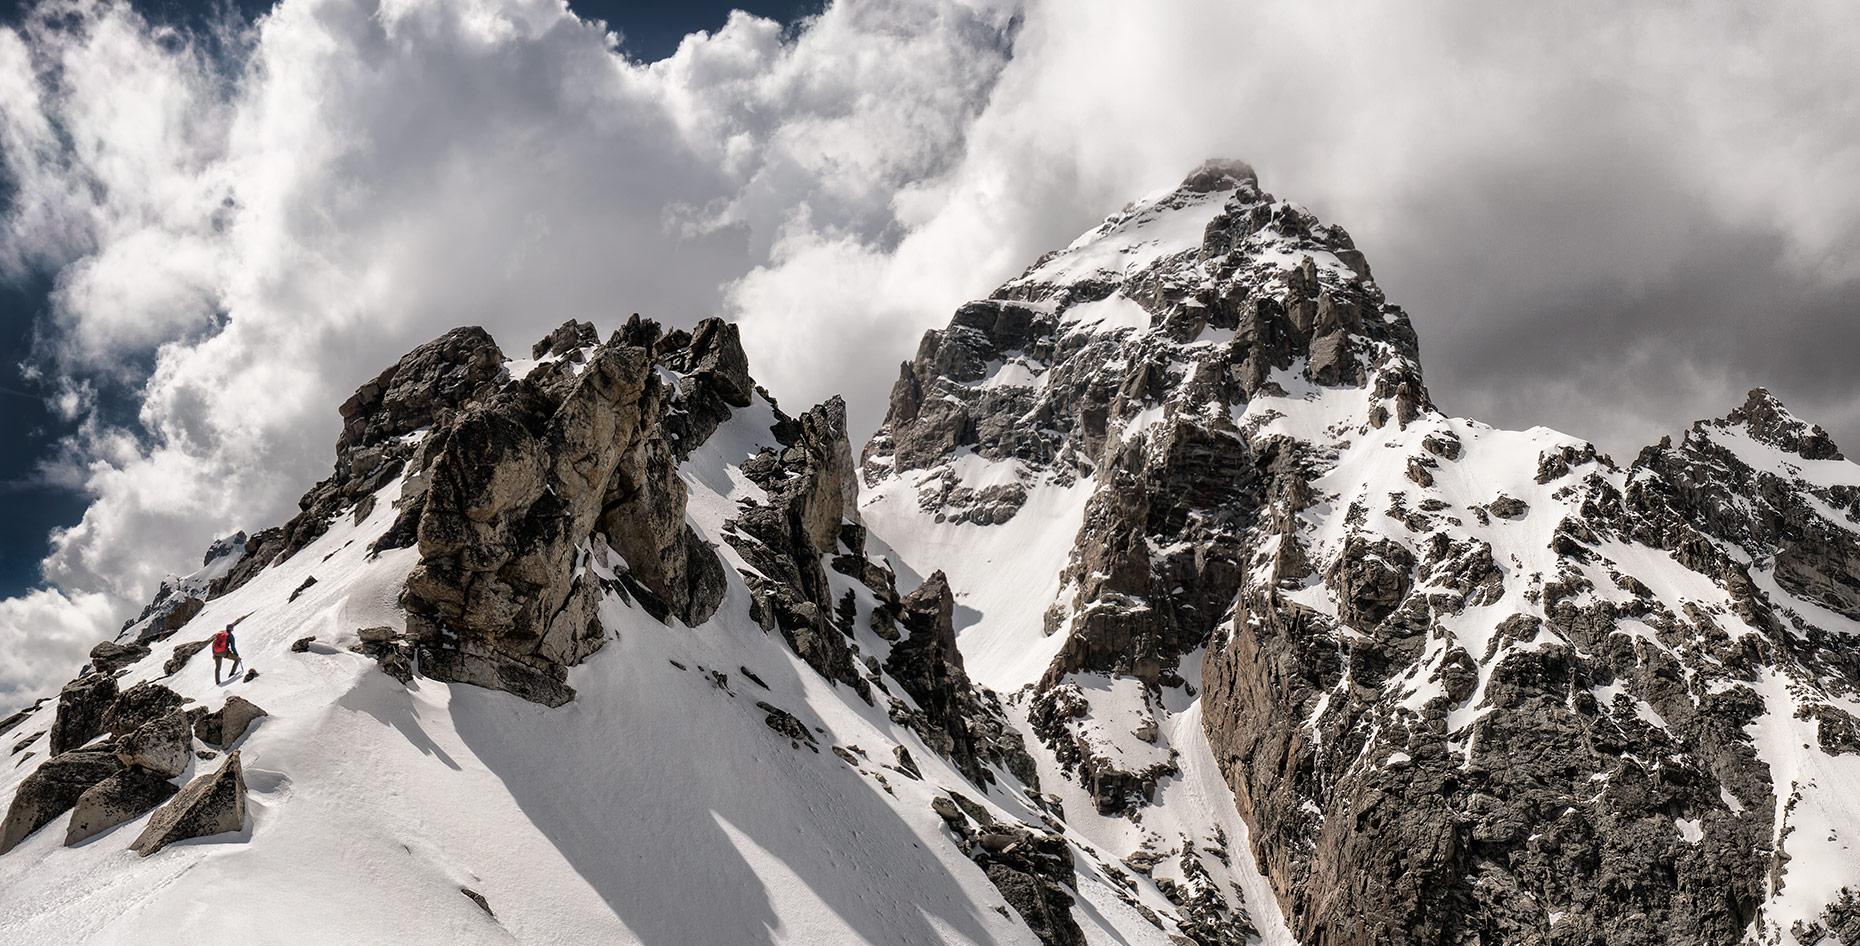 Lane_Peters_Multimedia_Dissapointment-Peak_Tetons.jpg